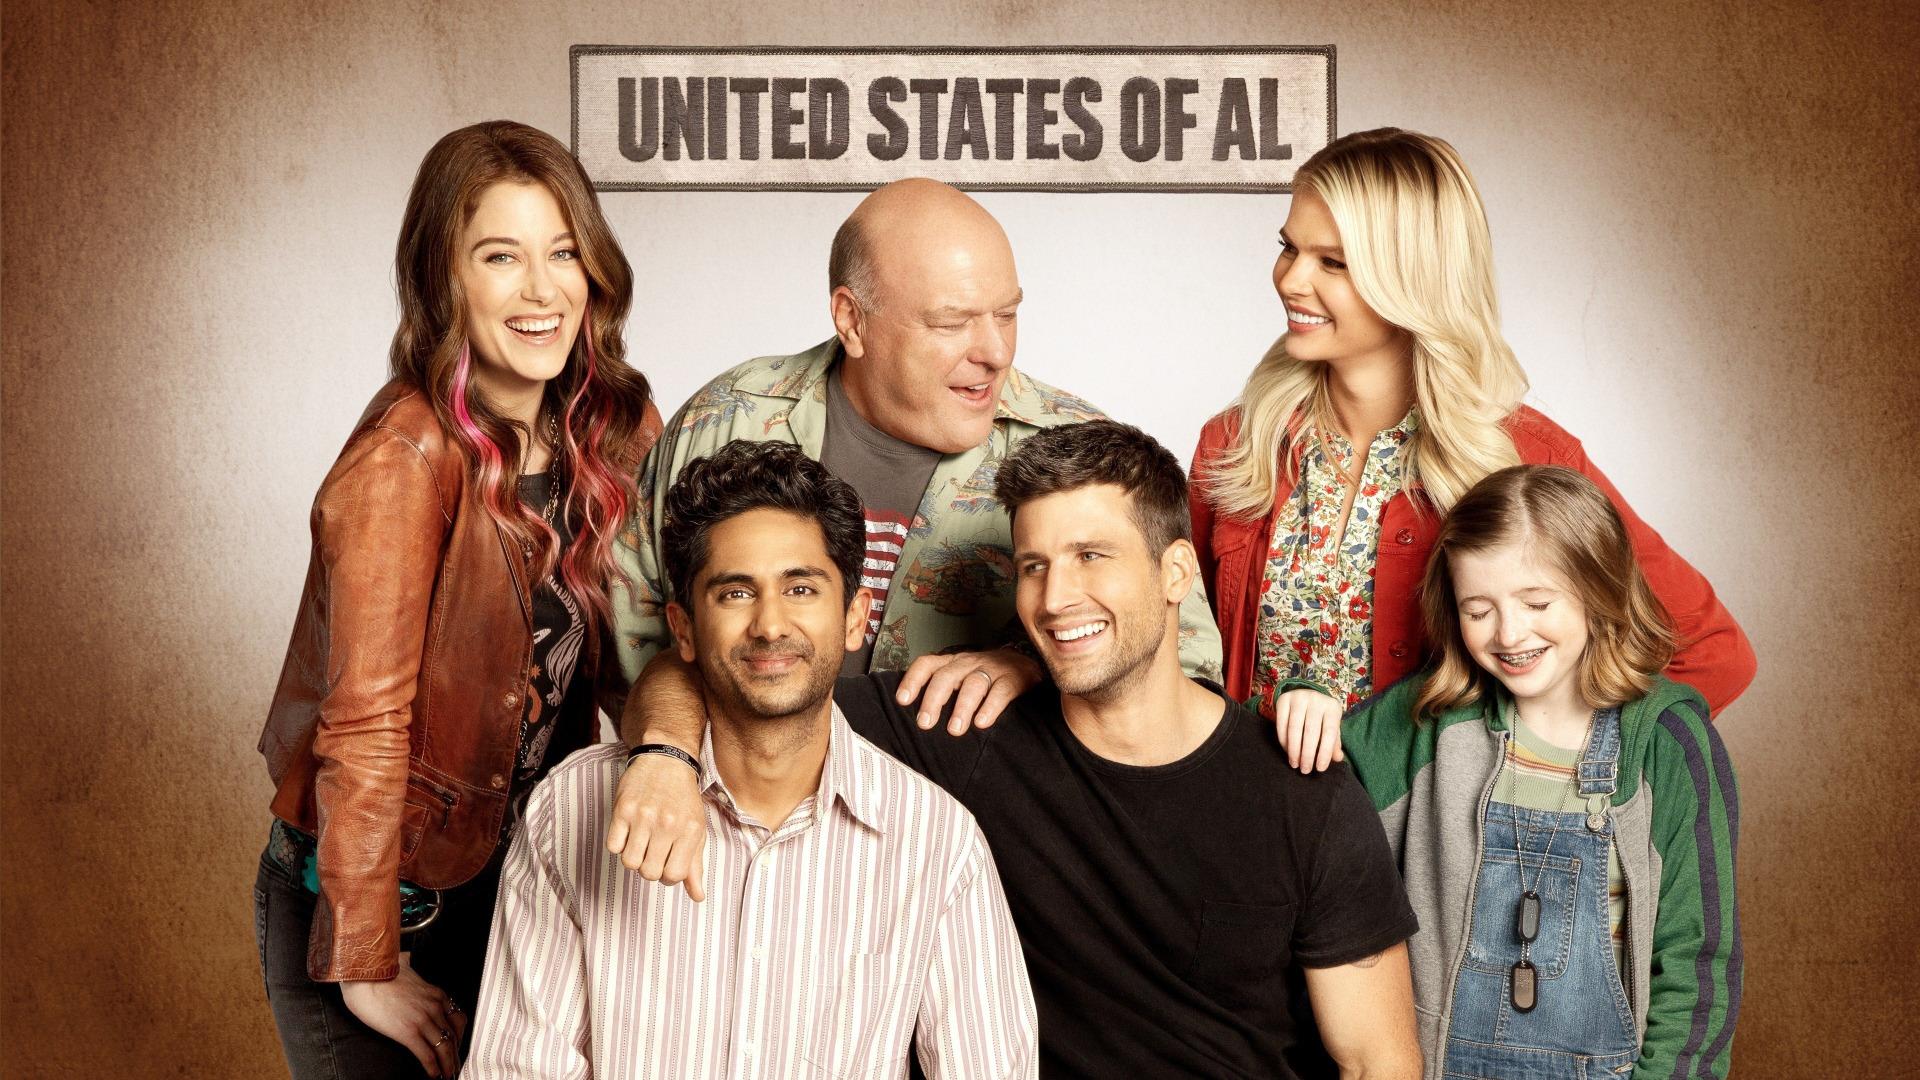 Show United States of Al